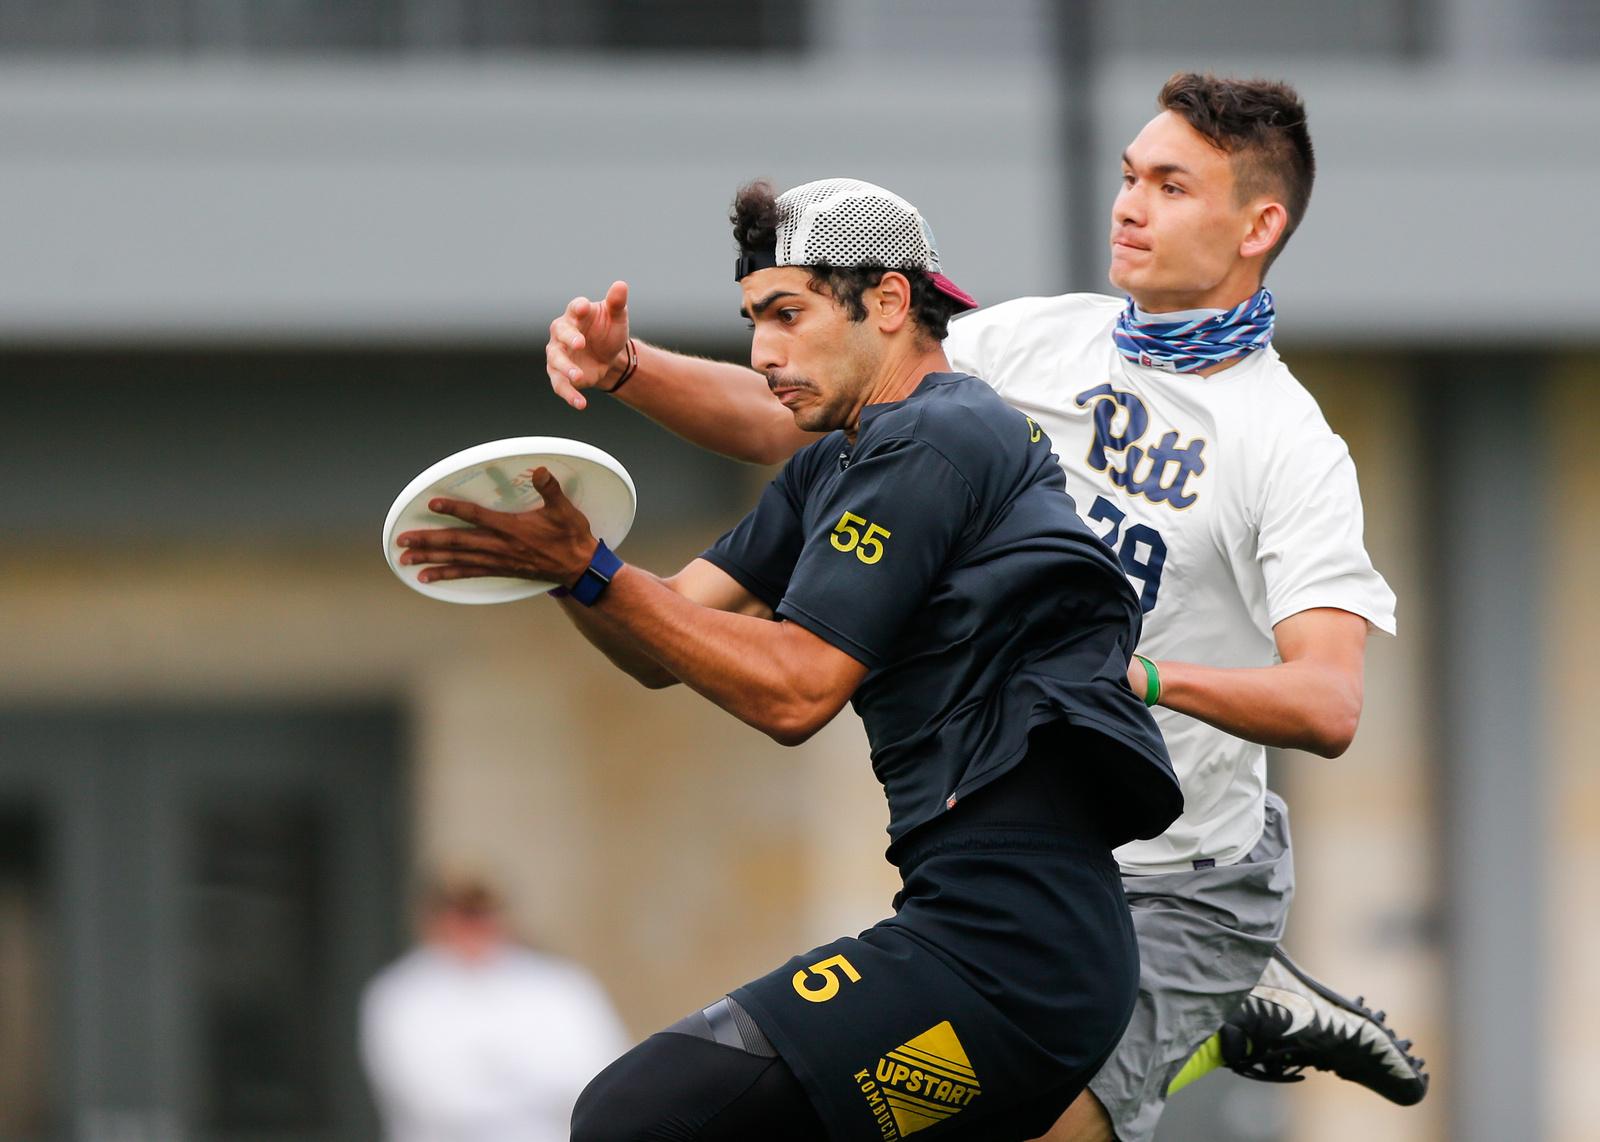 Video Thumbnail: 2019 College Championships, Men's Quarterfinal: Colorado vs. Pittsburgh